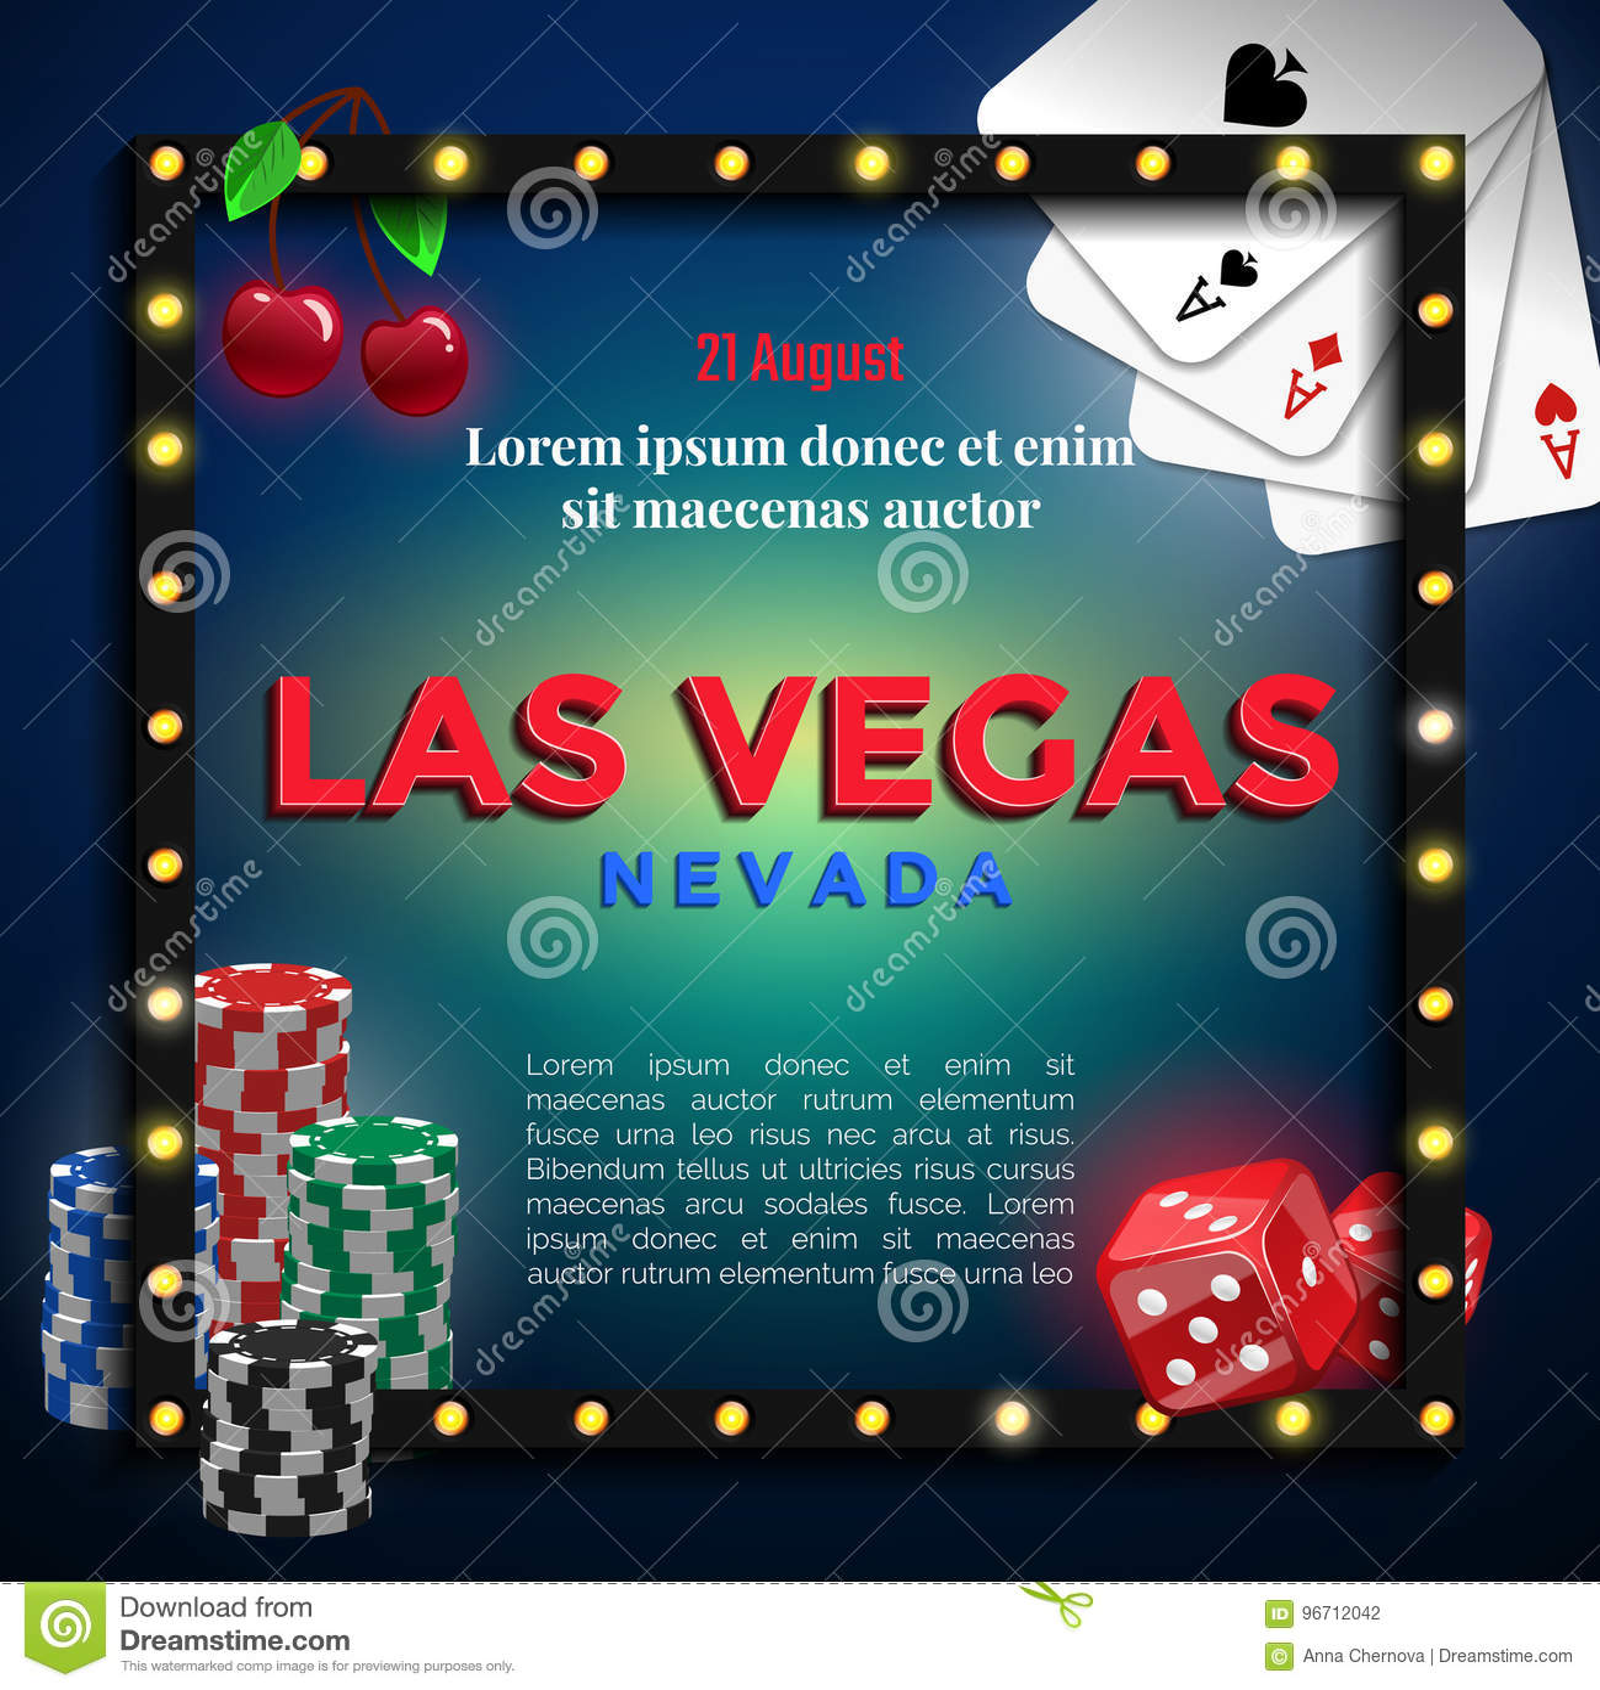 Las Vegas Background Design. Stock Vector - Illustration of card ...